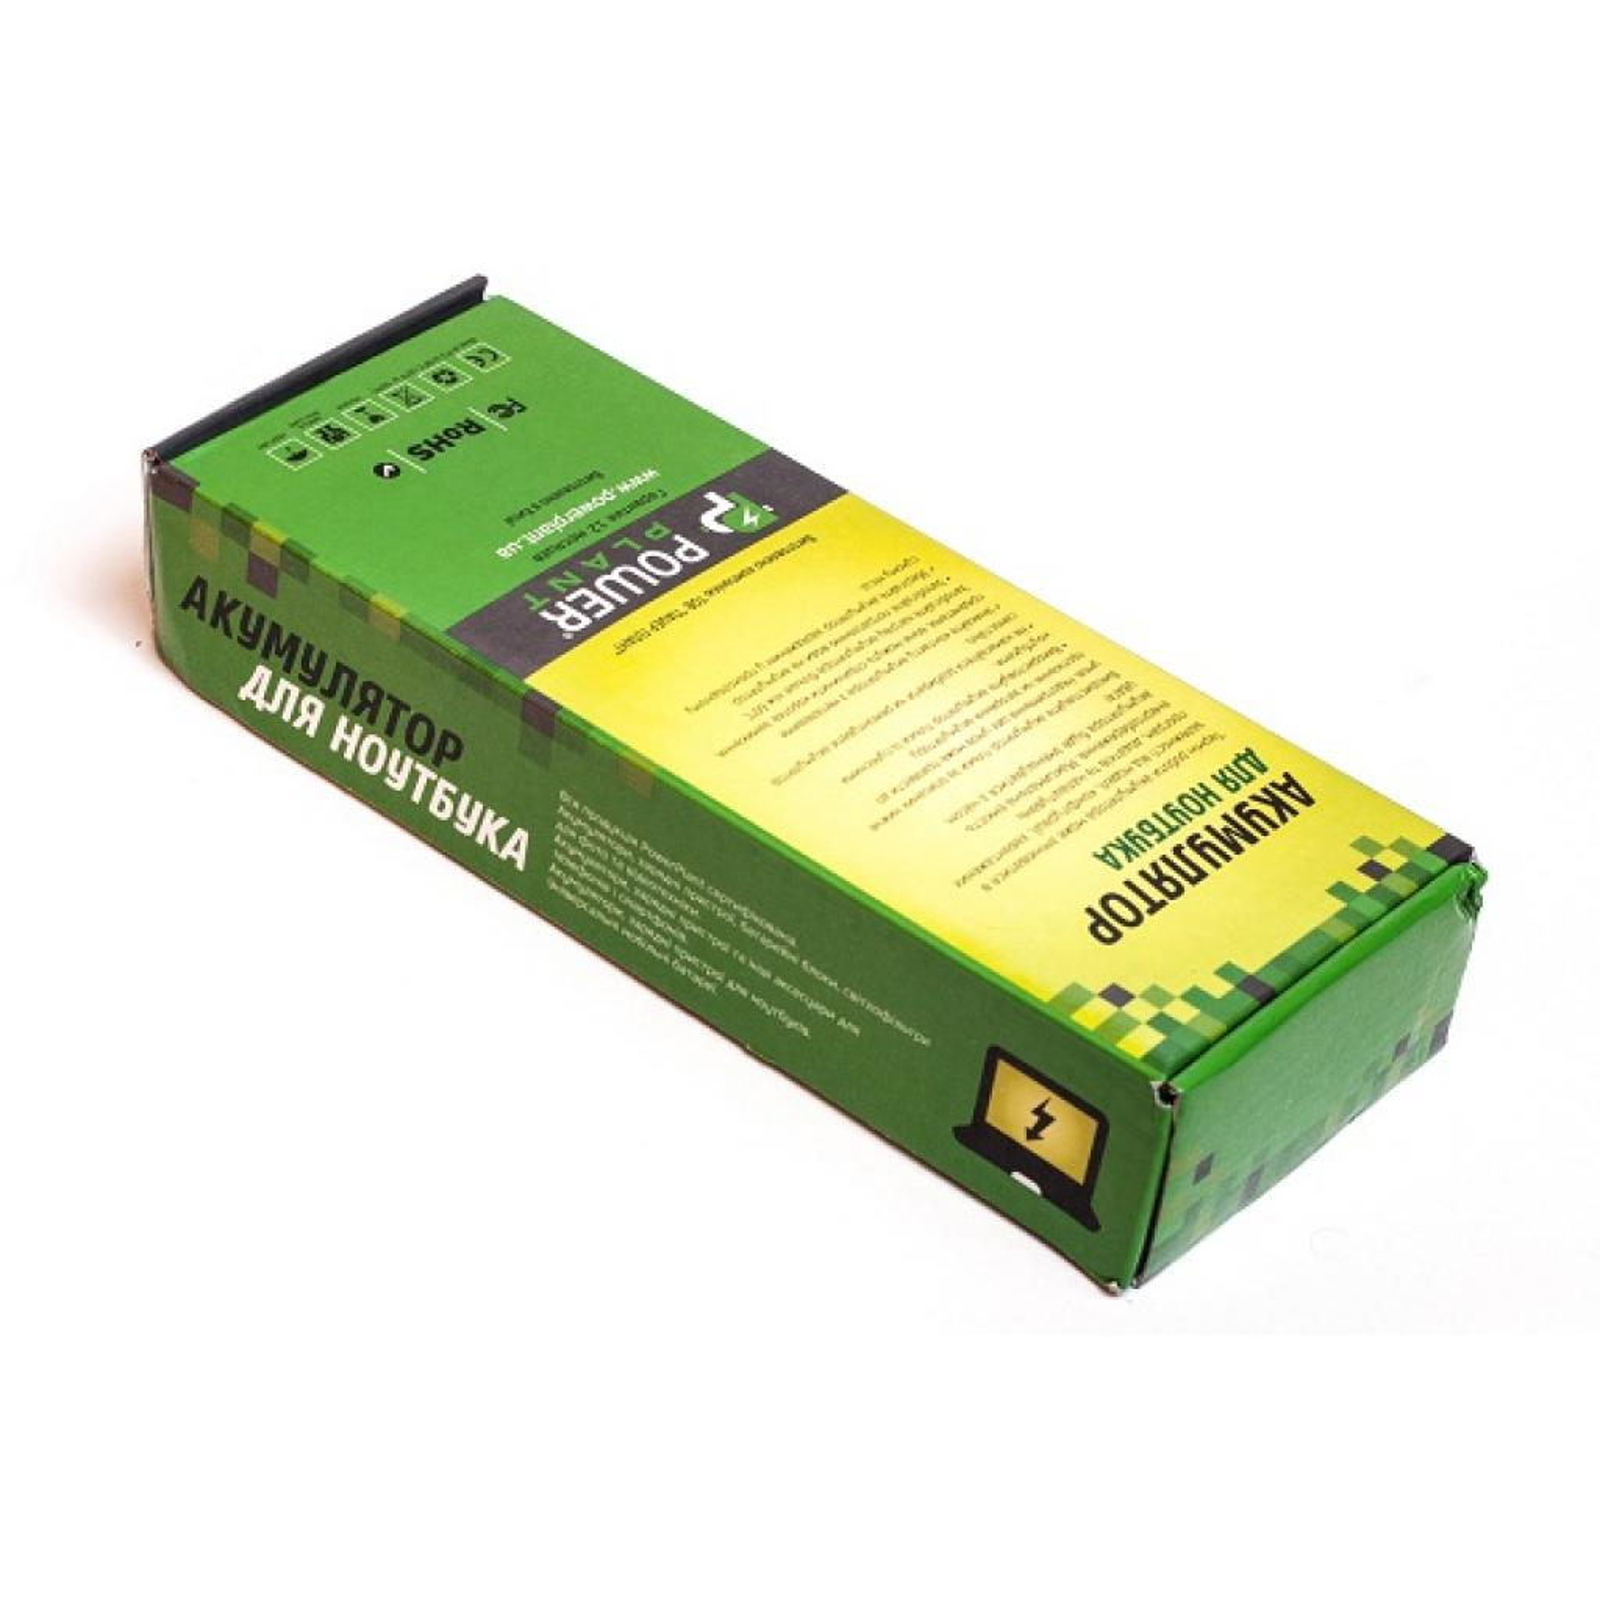 Аккумулятор для ноутбука ASUS Eee PC 1004DN (A31-U1 AS-U1F-6) 10,8V 4400mAh PowerPlant (NB00000173) изображение 2